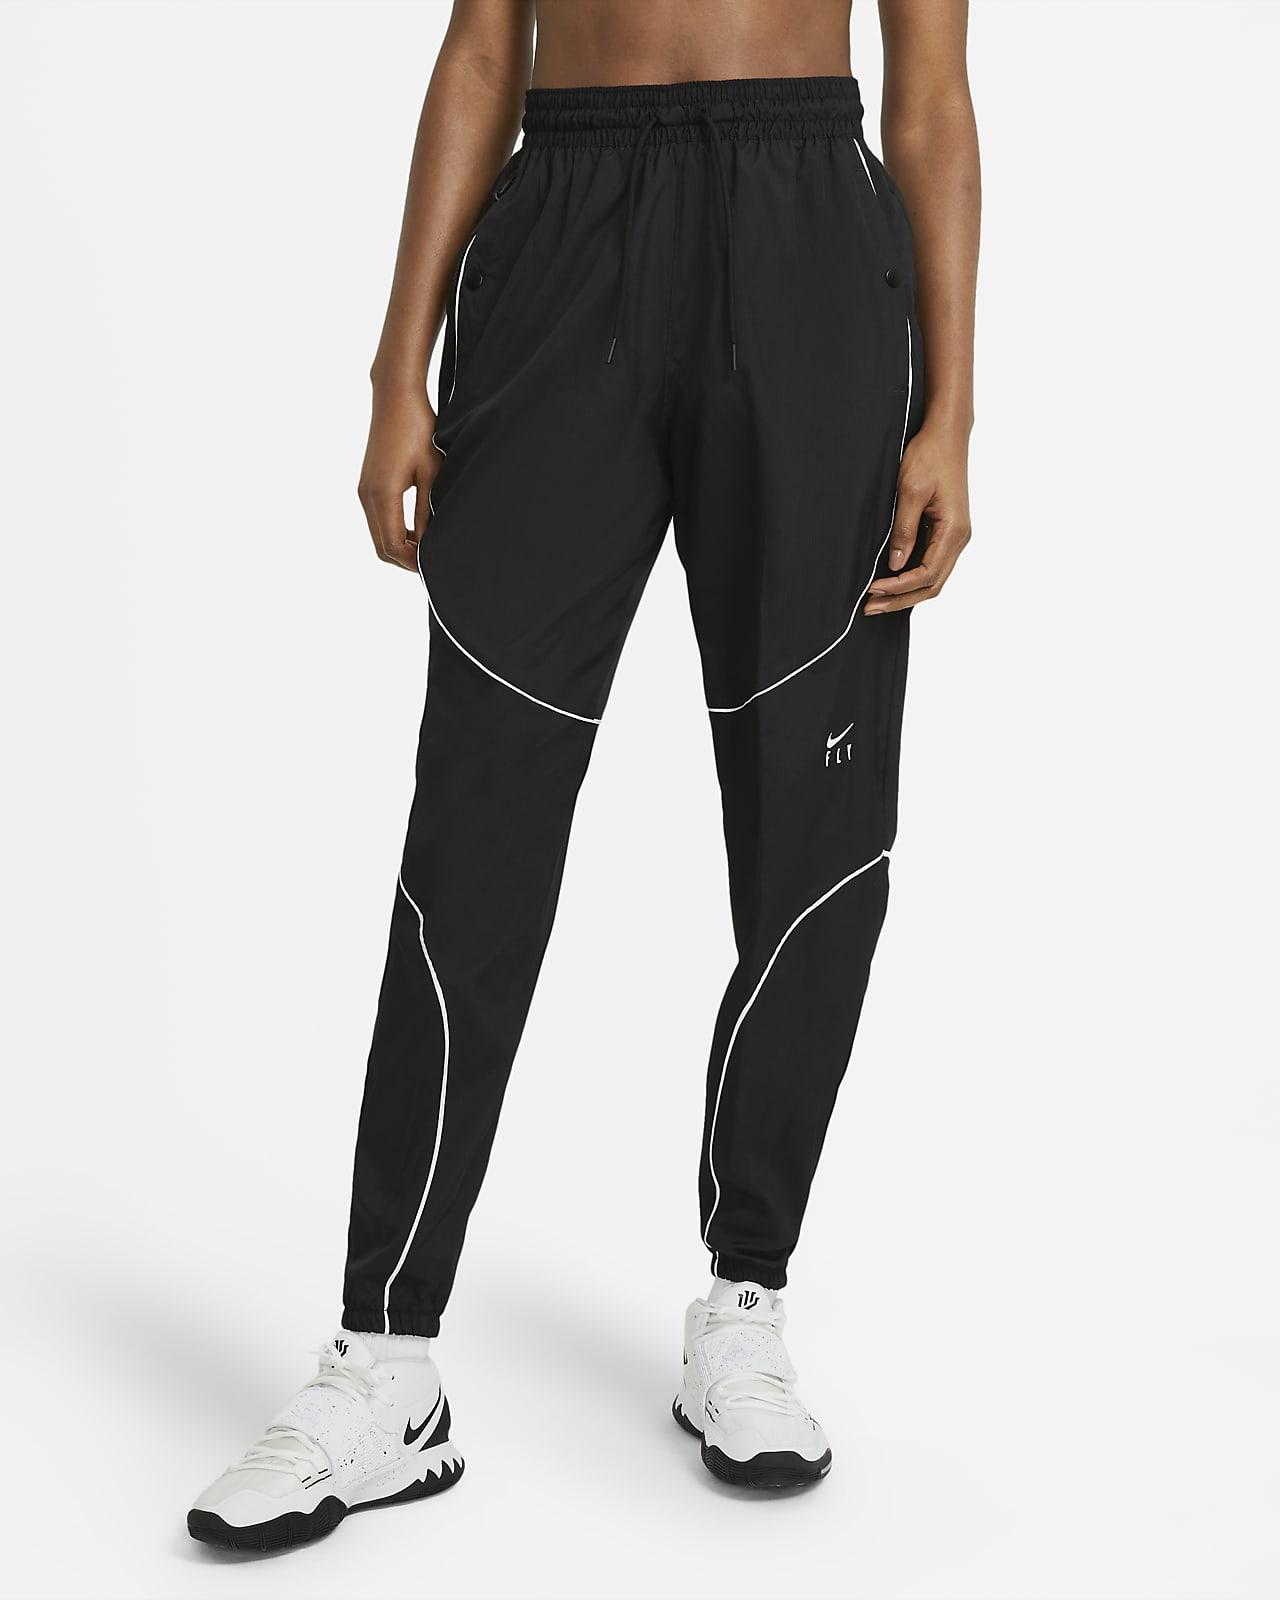 Nike Swoosh Fly Women's Basketball Trousers